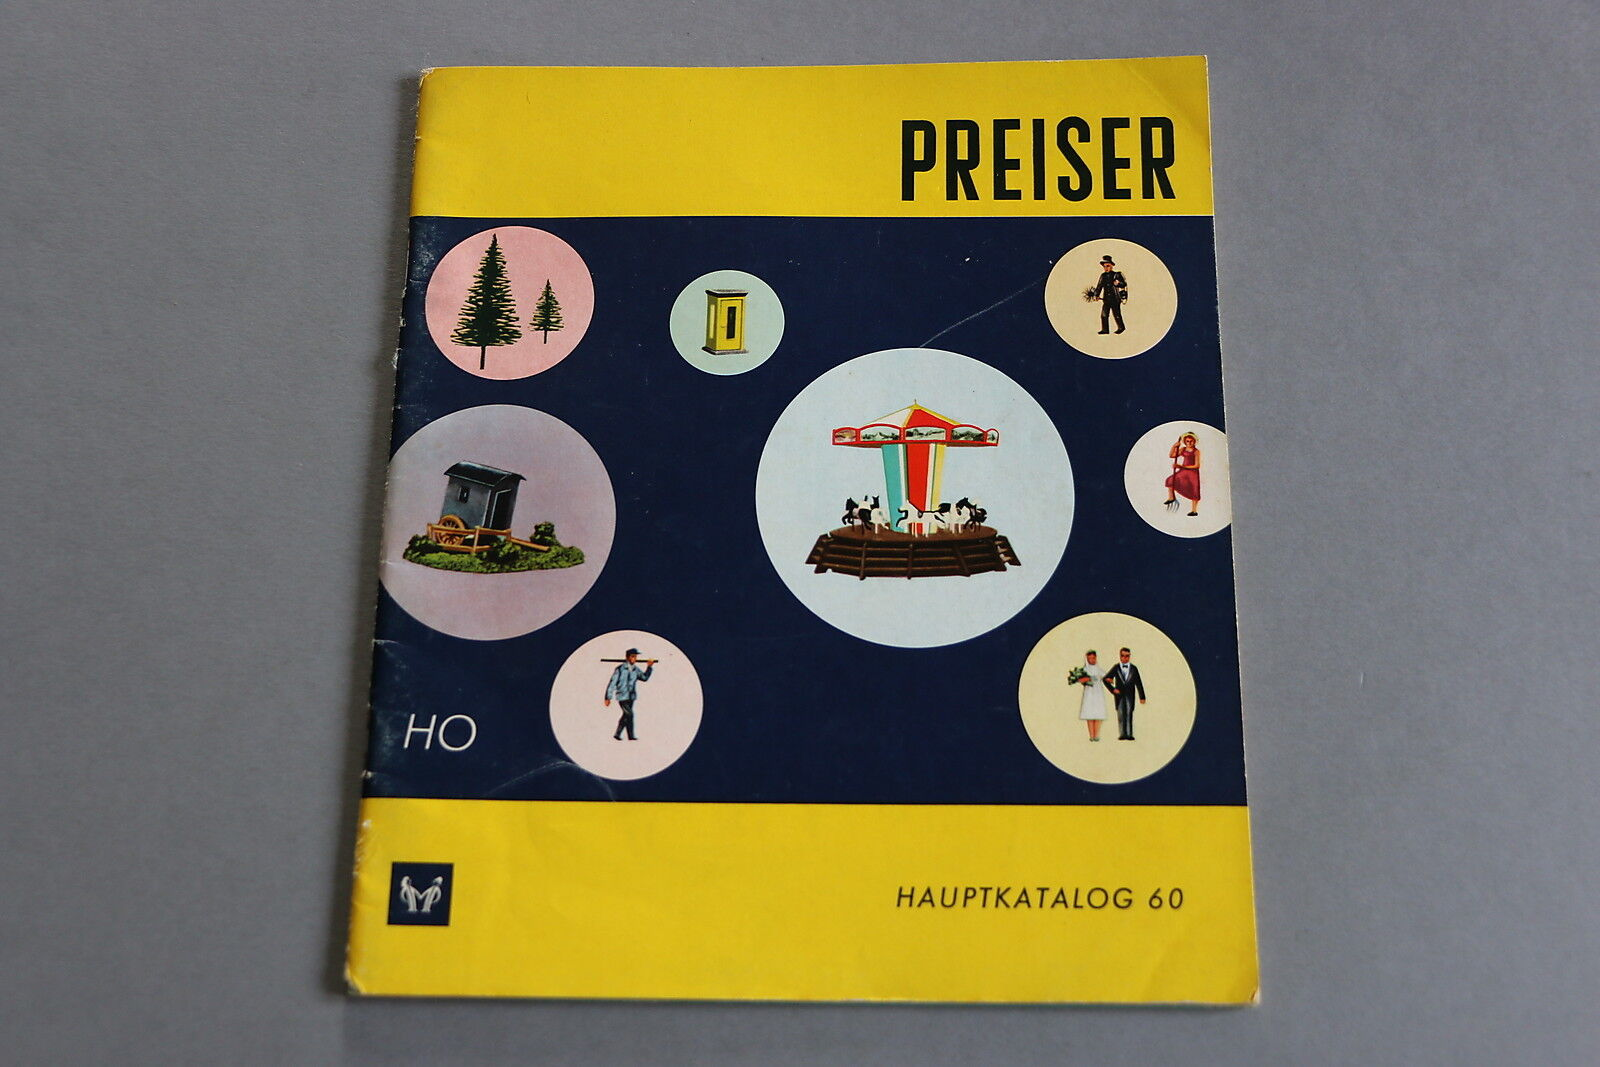 X418 PREISER Train personnage catalogueHo 1960 18*21 cm Deutsch F angl It